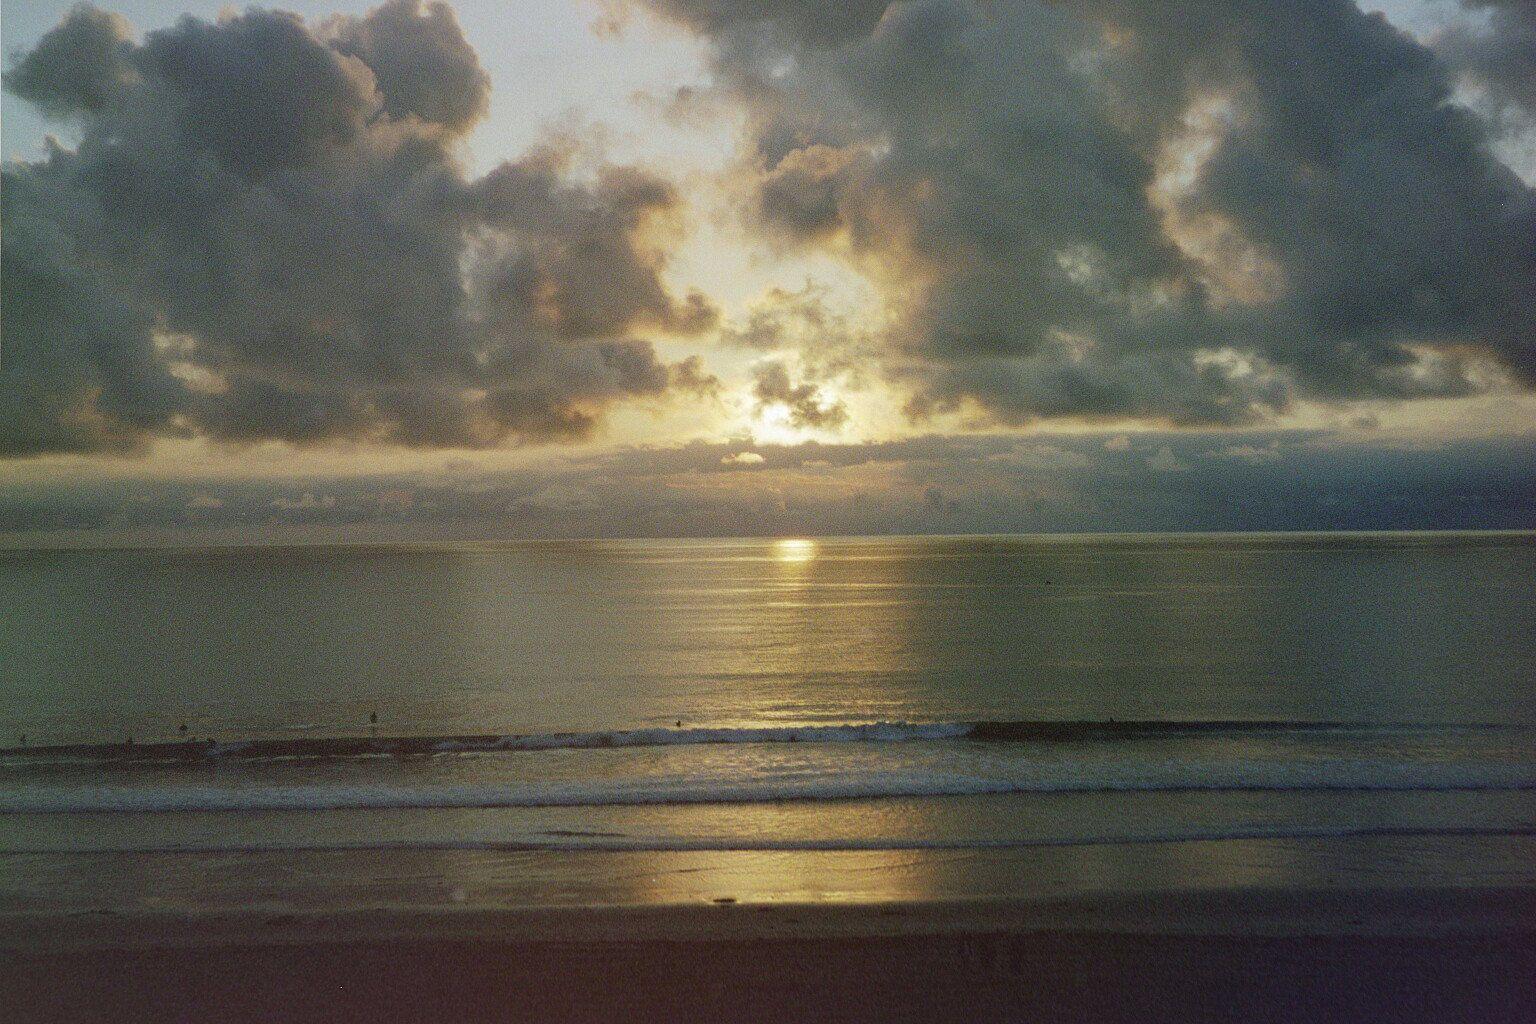 Sunset Jesus Poems Sunsets Vicasso Pinterest Sunset And Poem